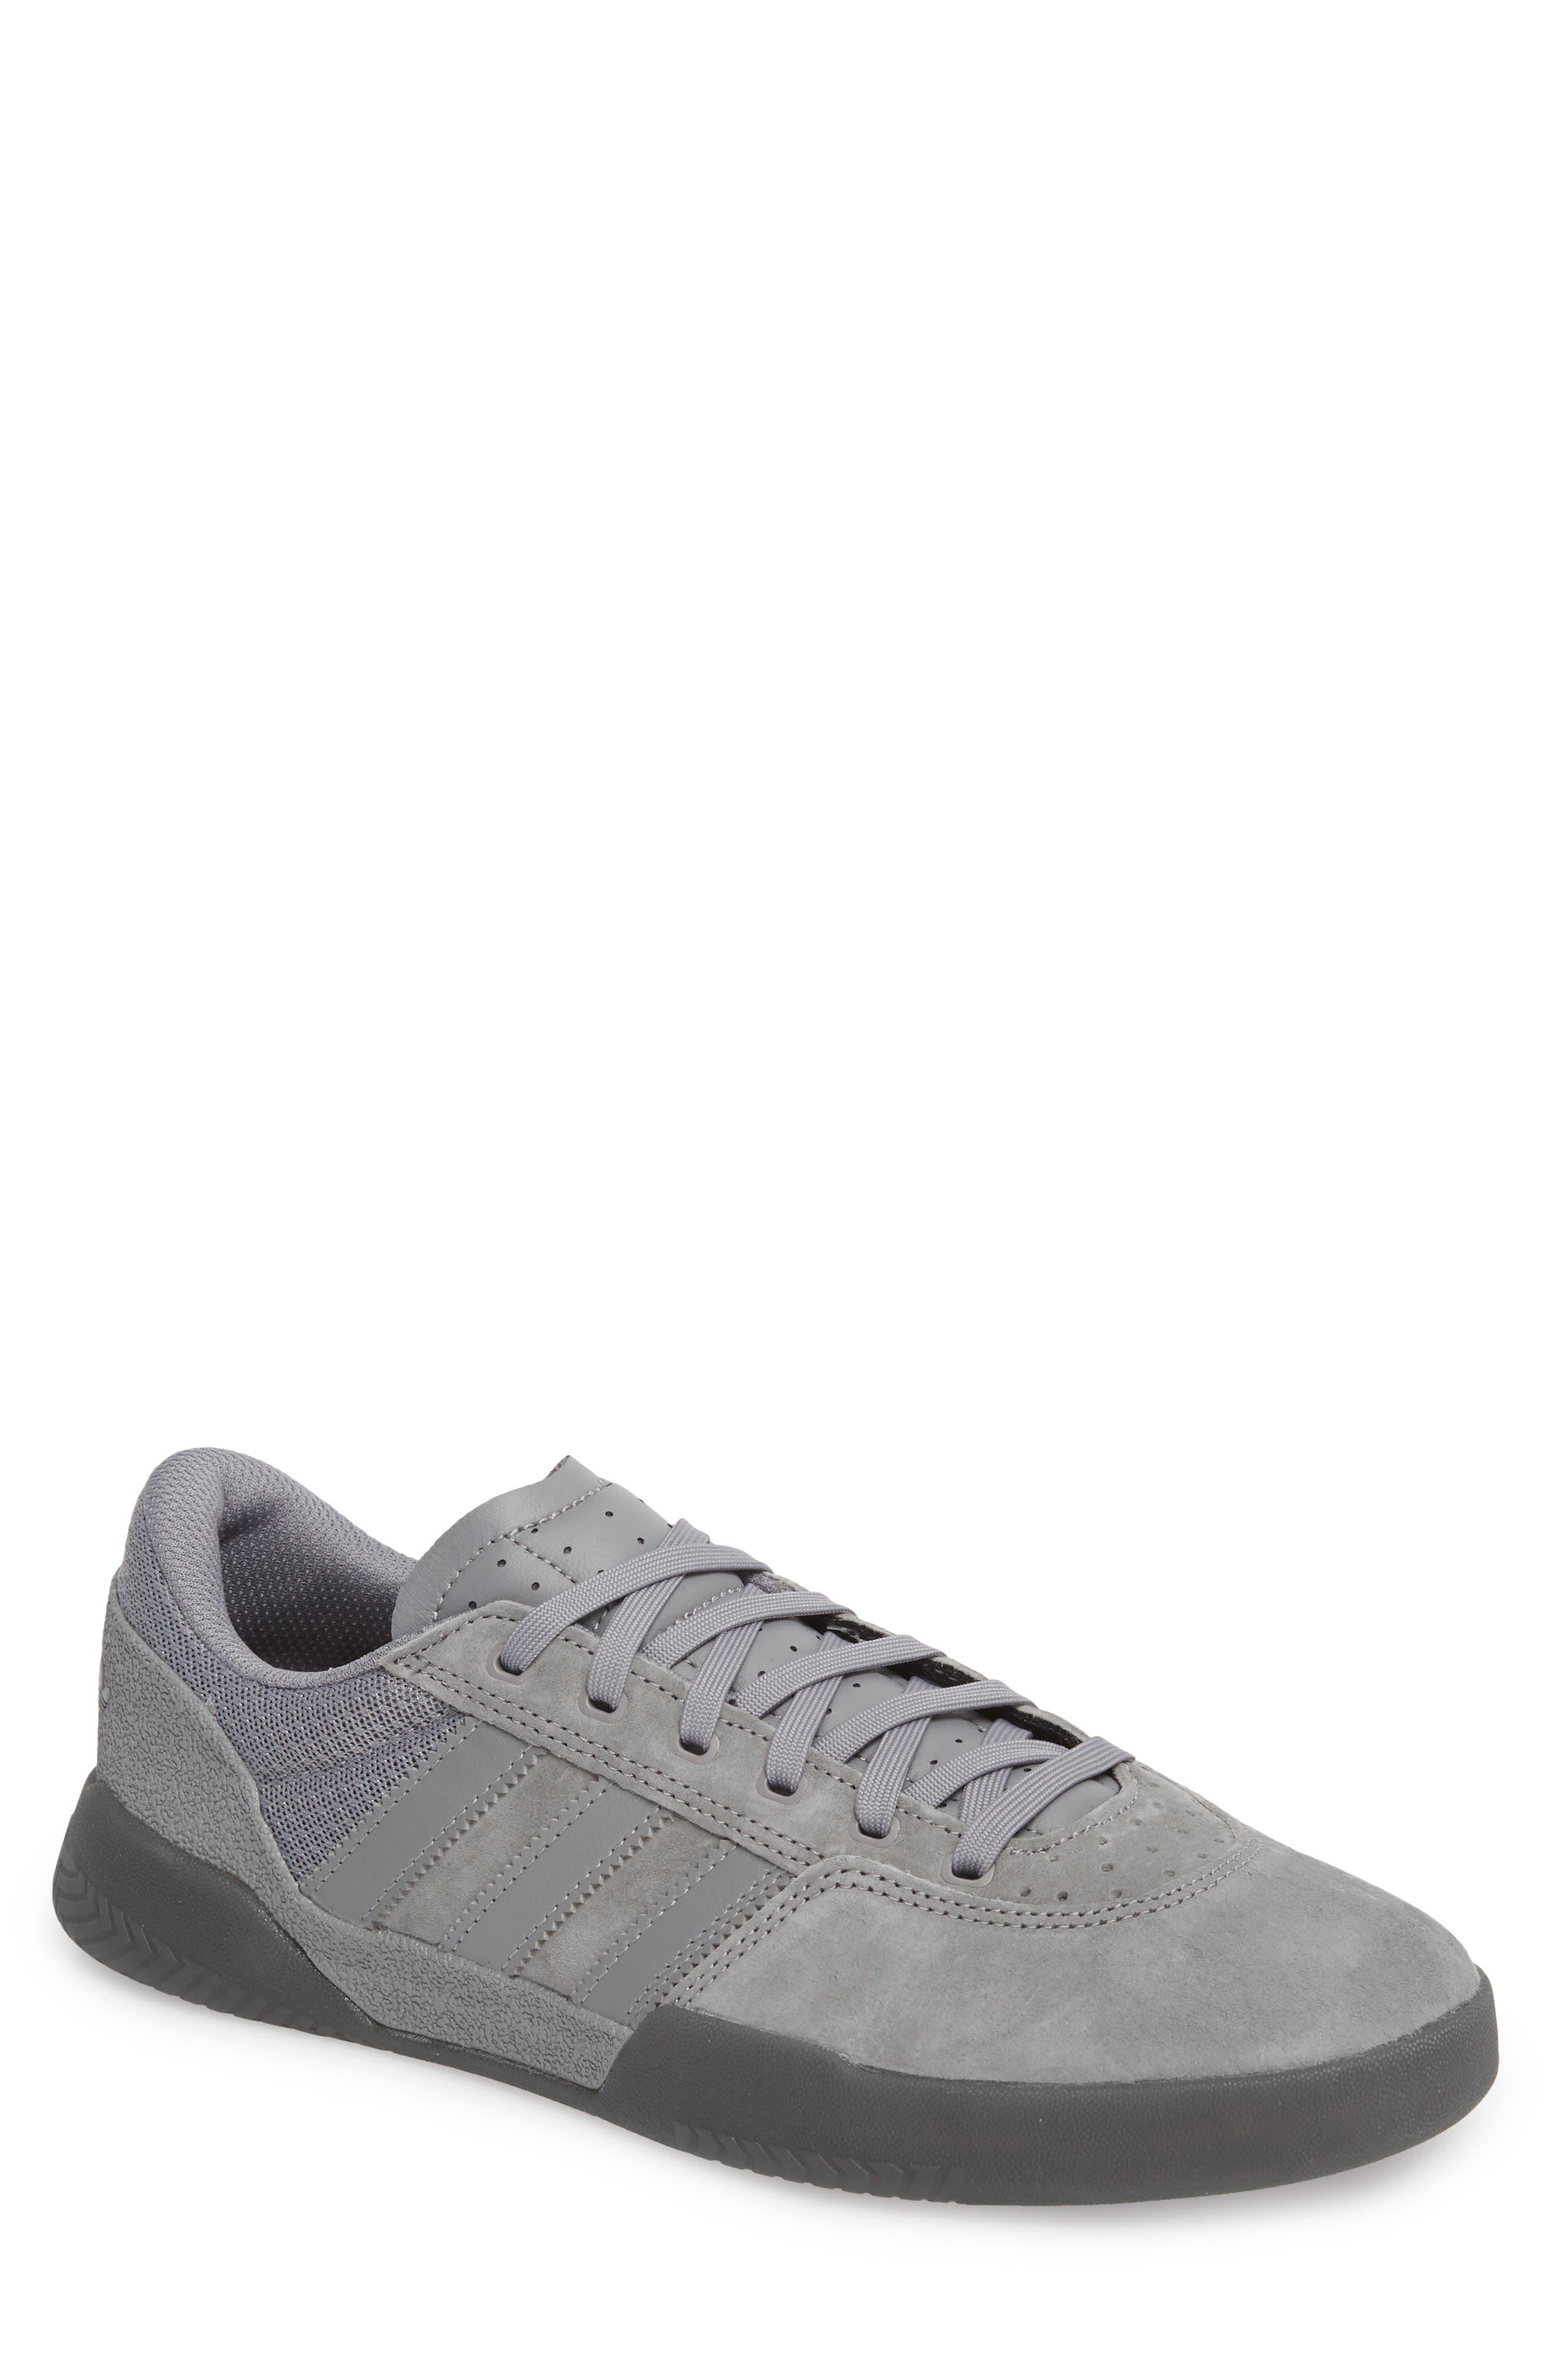 City Cup Sneaker,                             Main thumbnail 1, color,                             Grey/ Gold